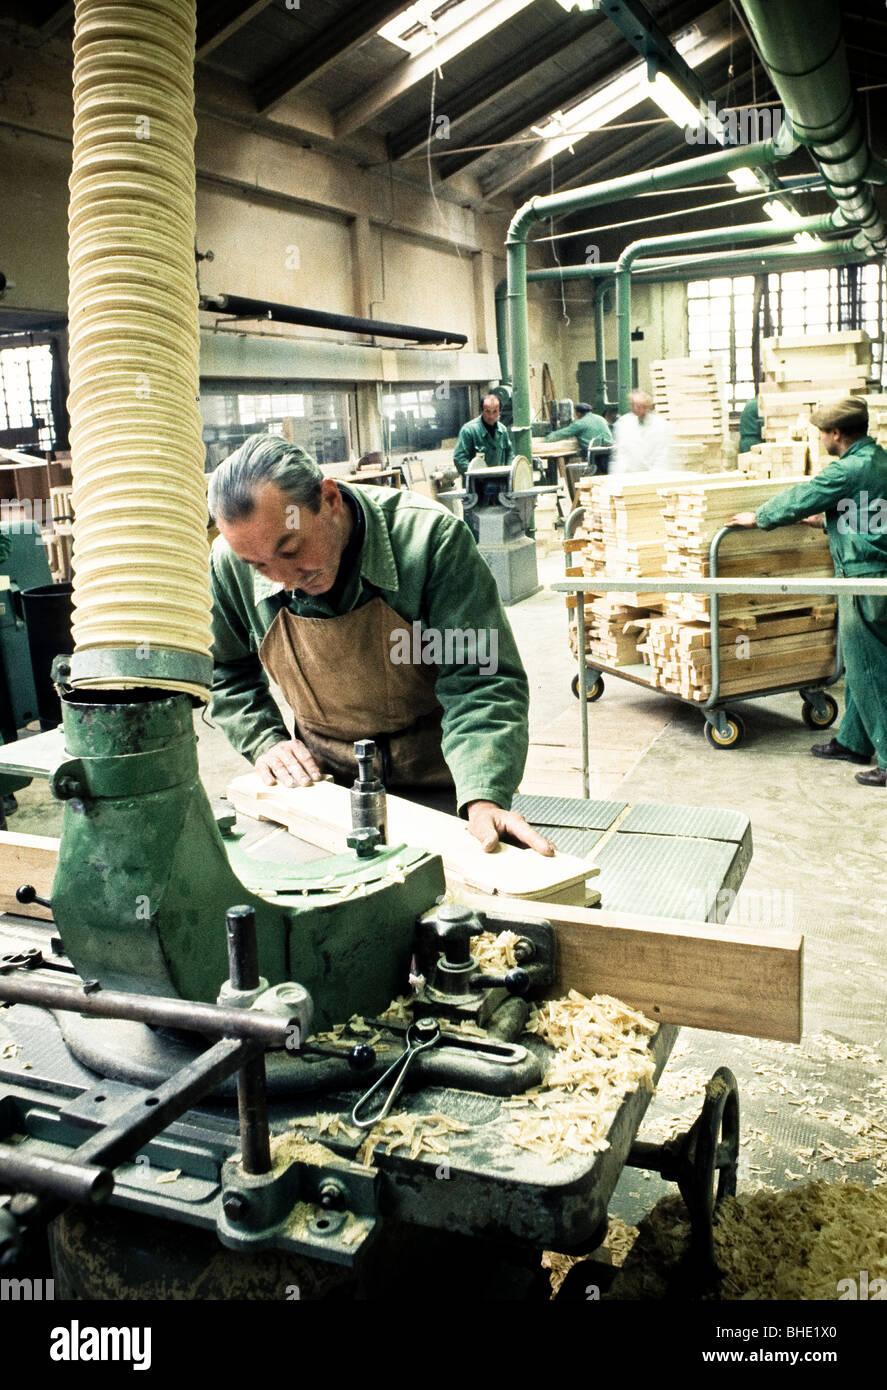 furniture, industry, brianza, lombardia, italy stock photo